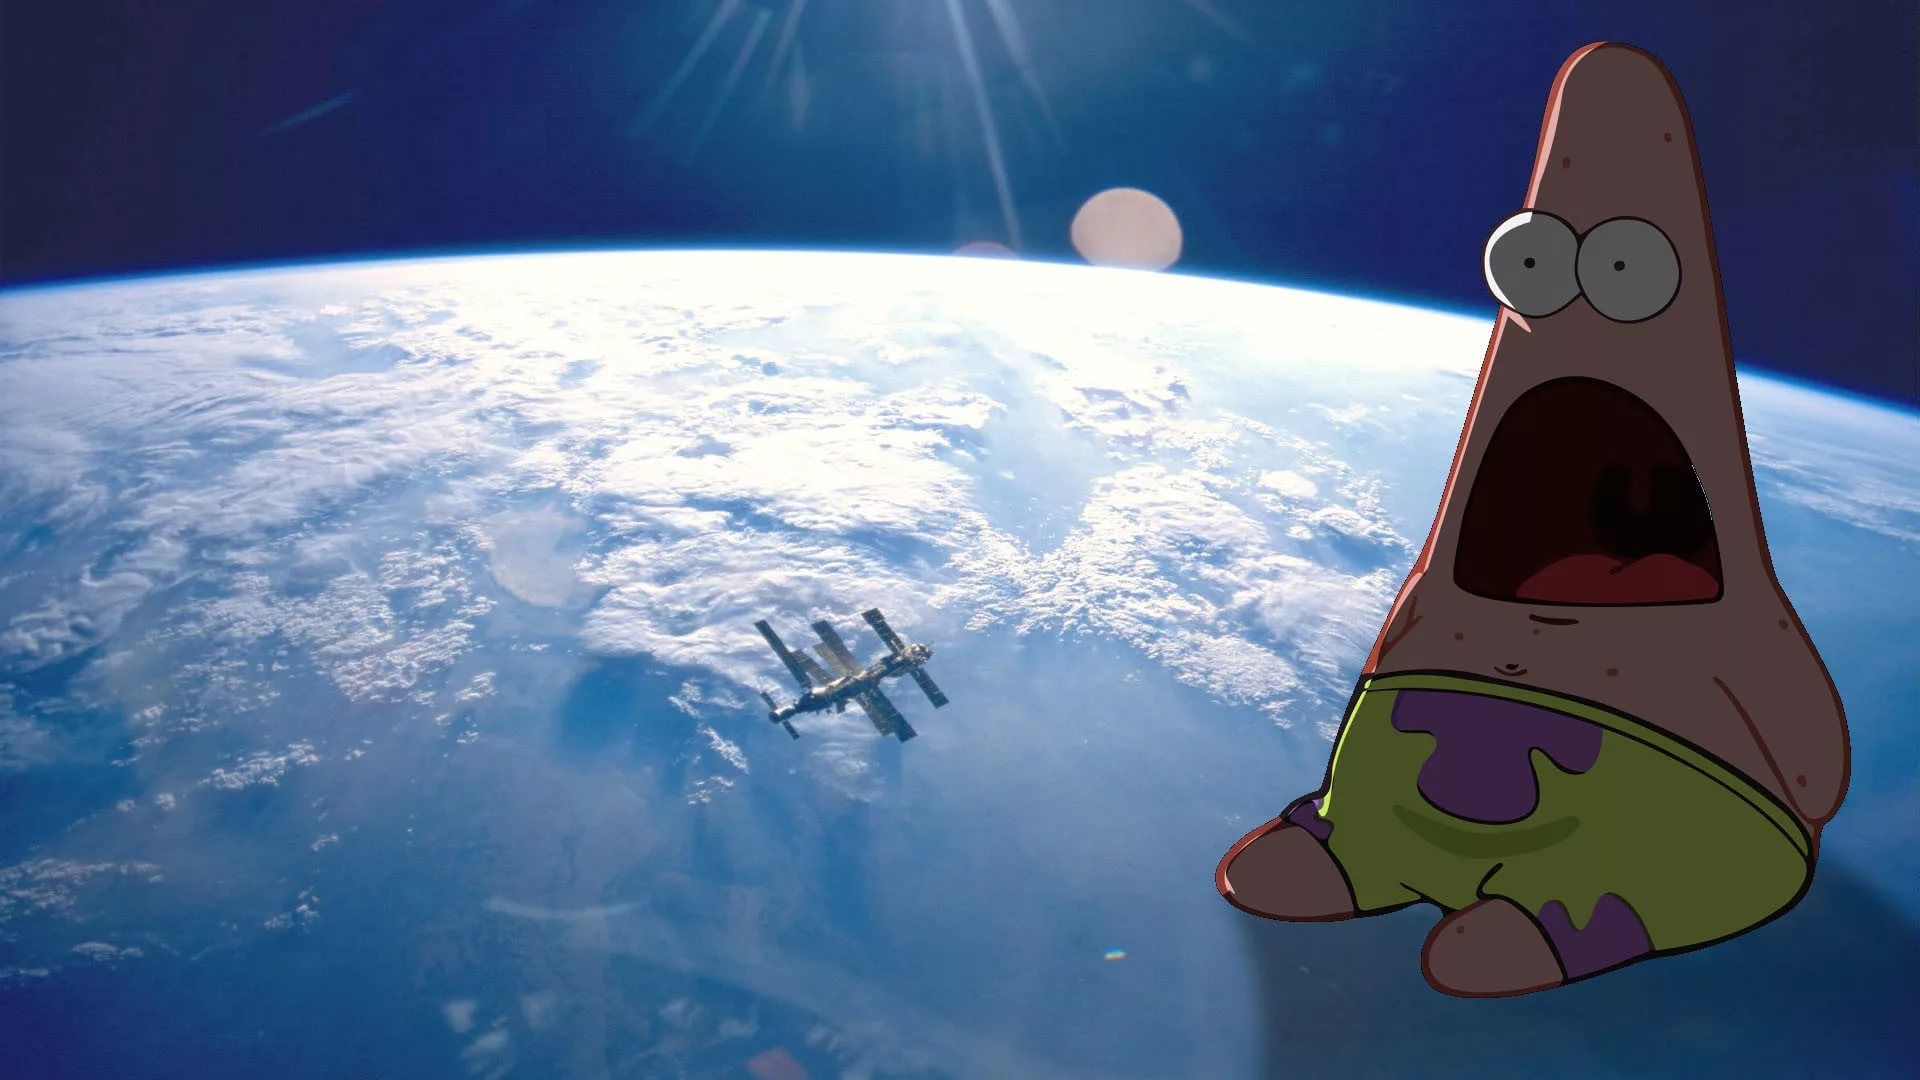 Patrick Image